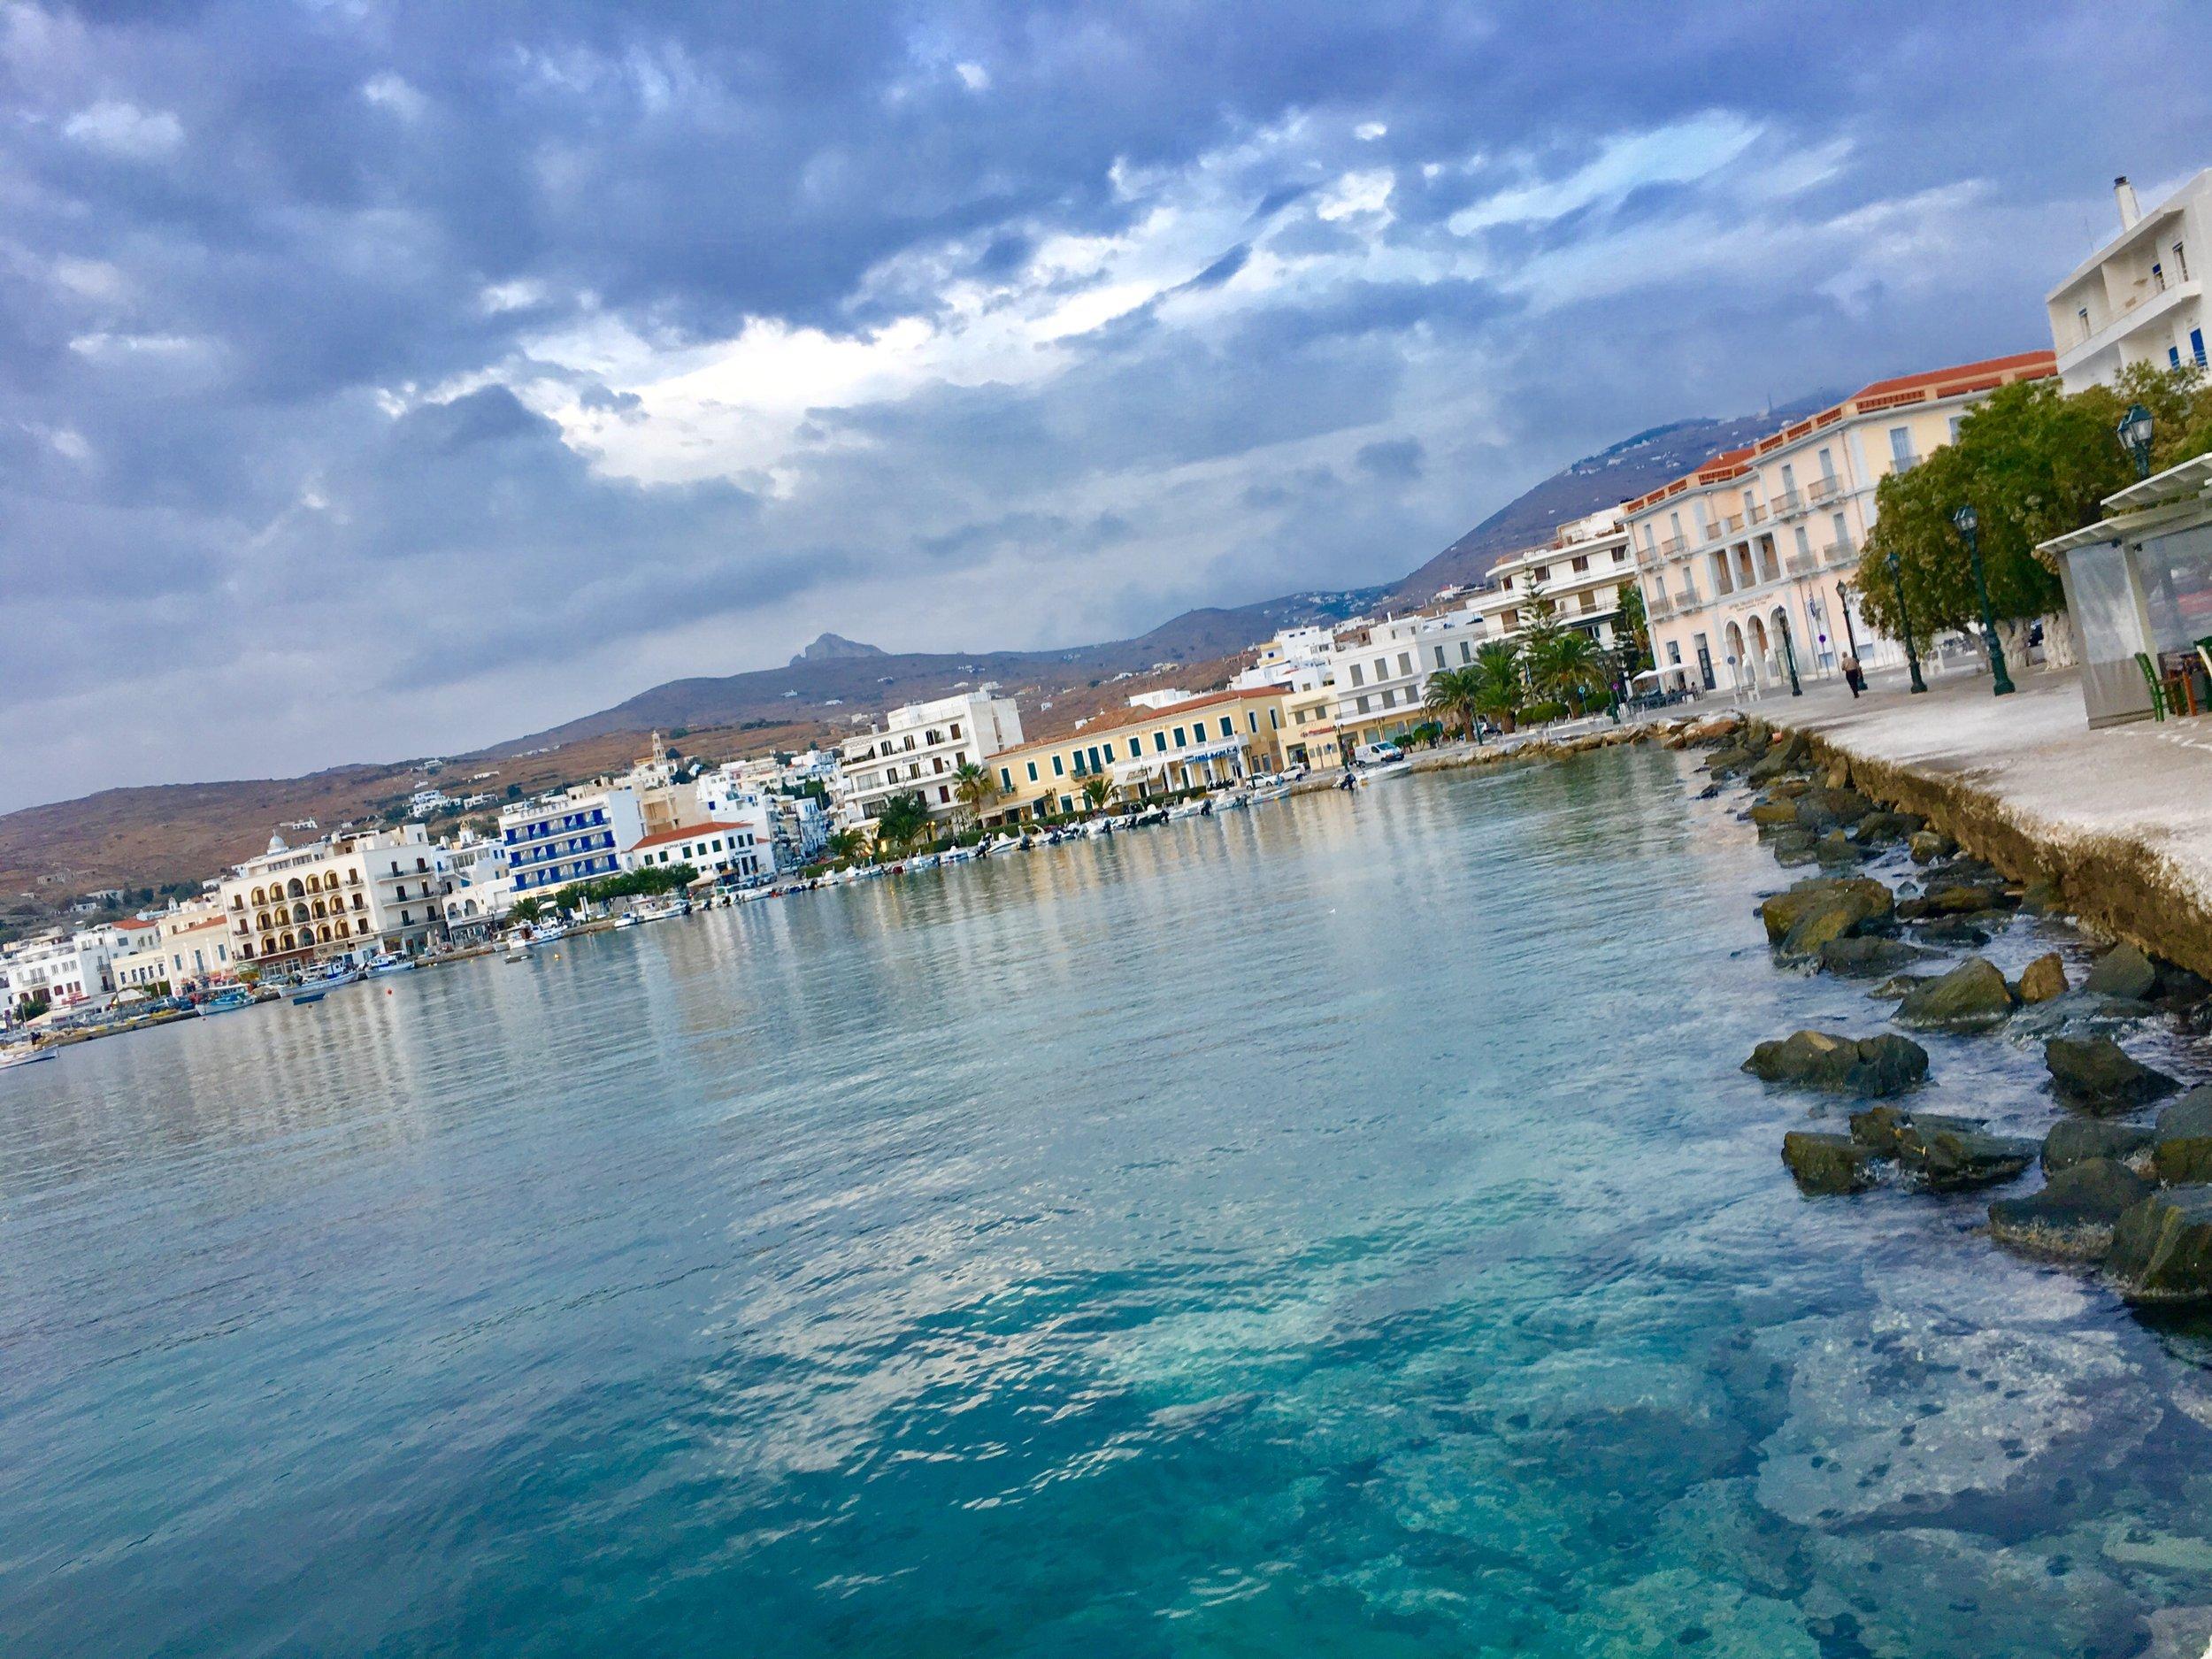 Tinos, Greece - September - October 2019